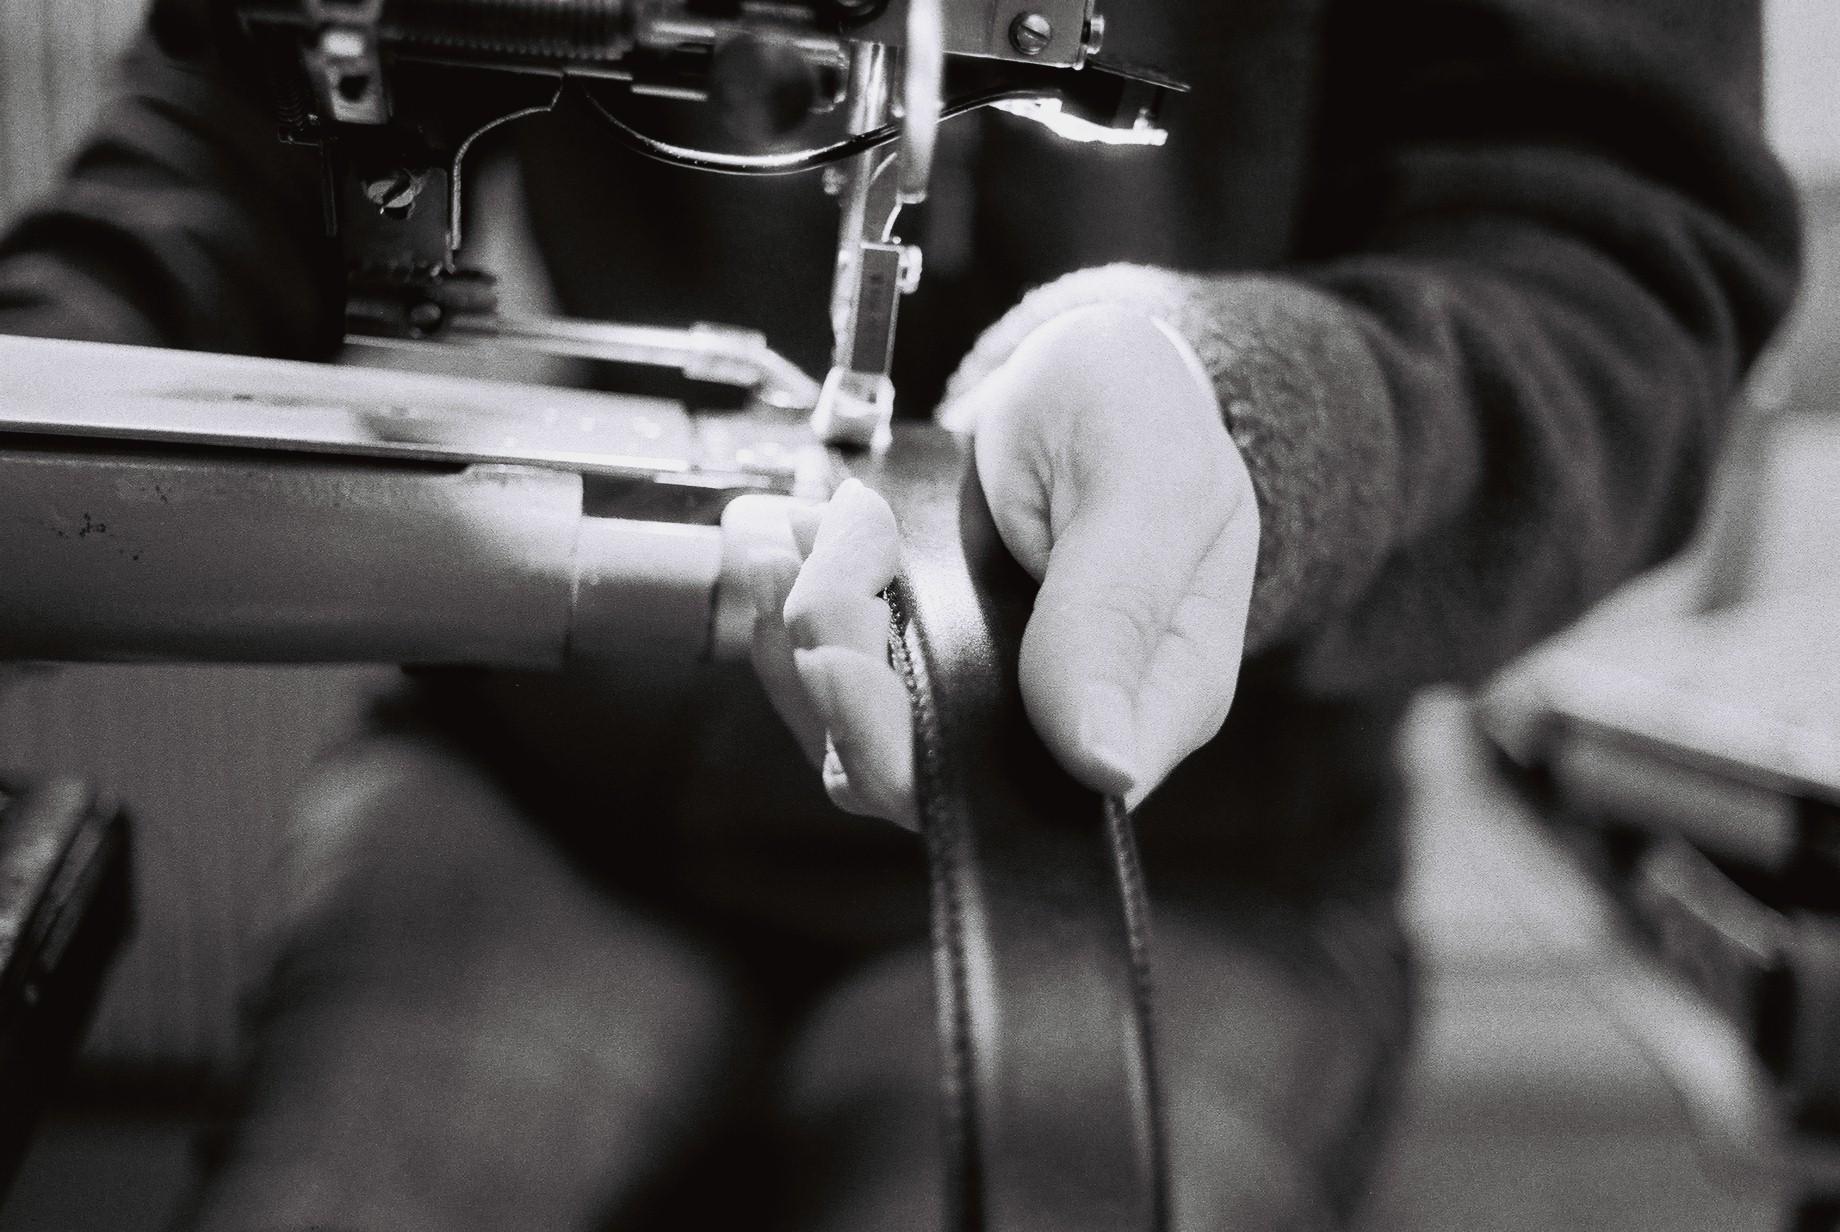 Artling_Ceinture sur mesure_Processus de fabrication_6